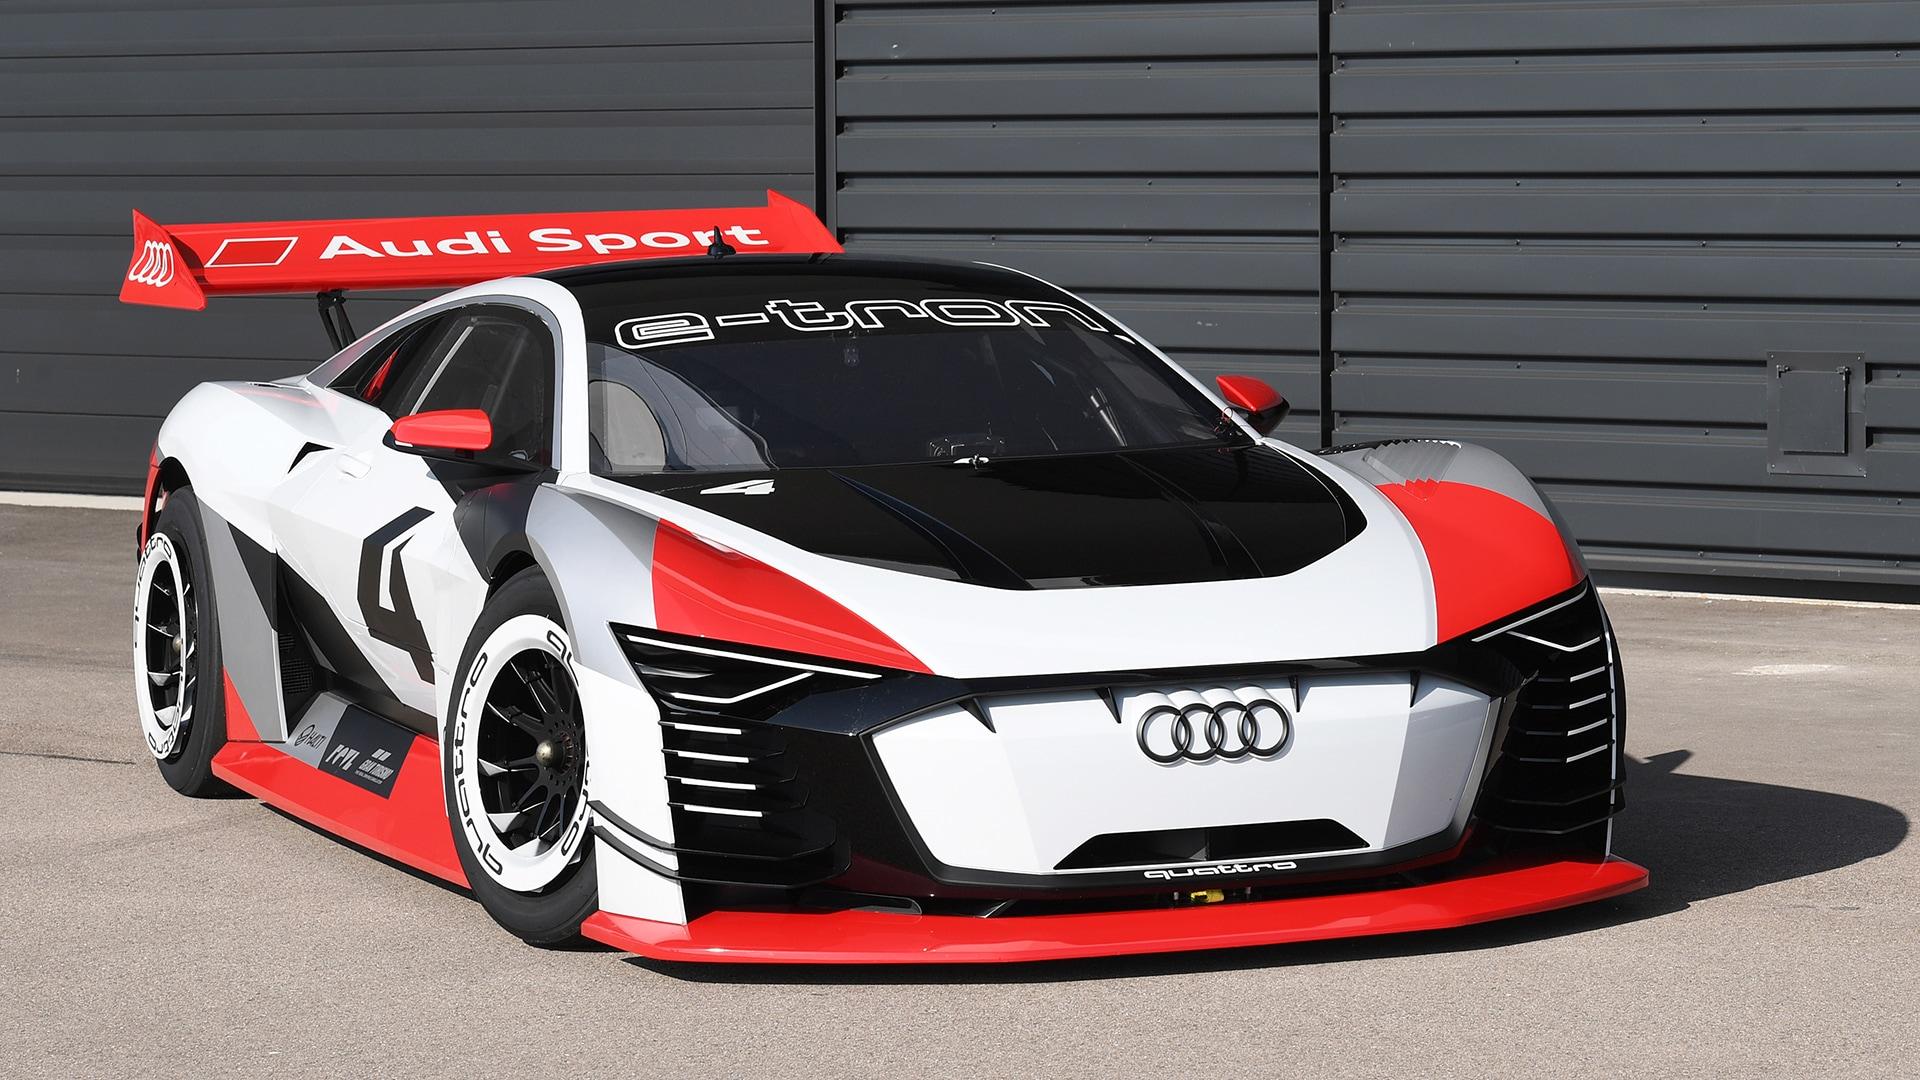 70 Great Audi Vision 2020 Interior for Audi Vision 2020